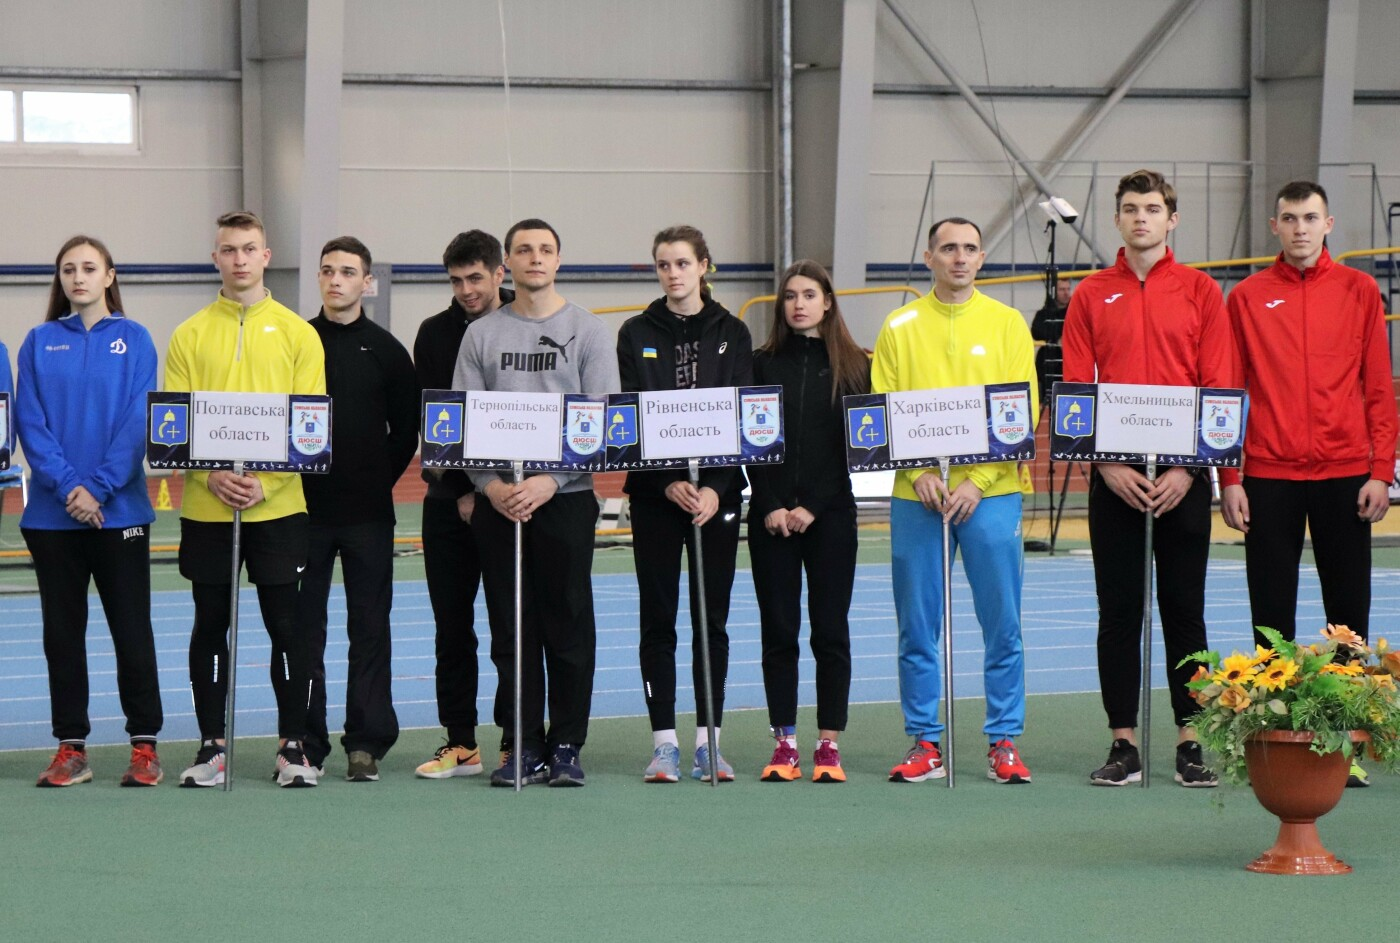 У Сумах змагаються легкоатлети України, Казахстану та Киргизстану, фото-4